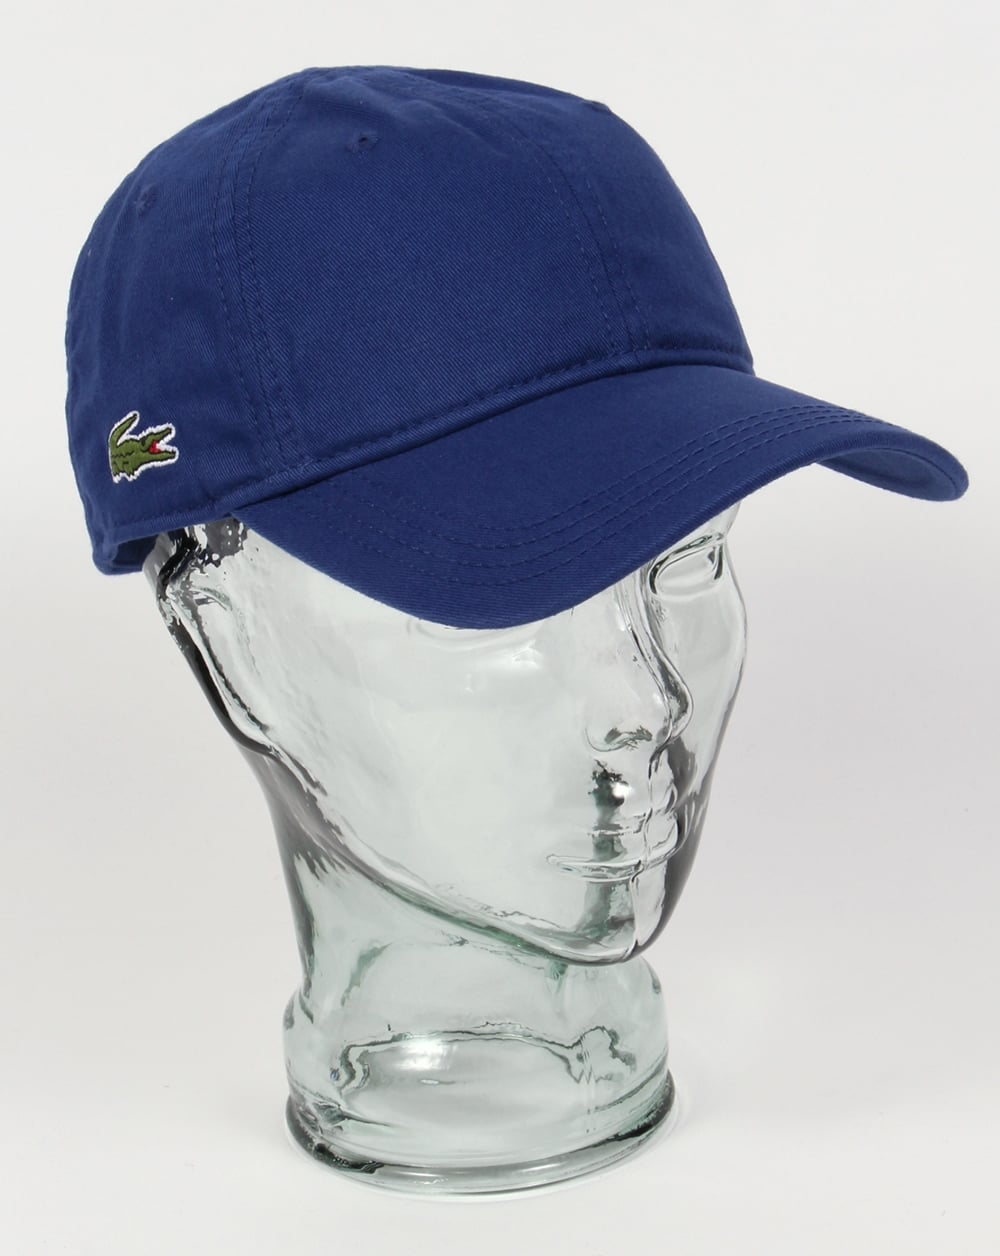 90ff81b2a617 Lacoste Lacoste Gabardine Baseball Cap Royal Blue